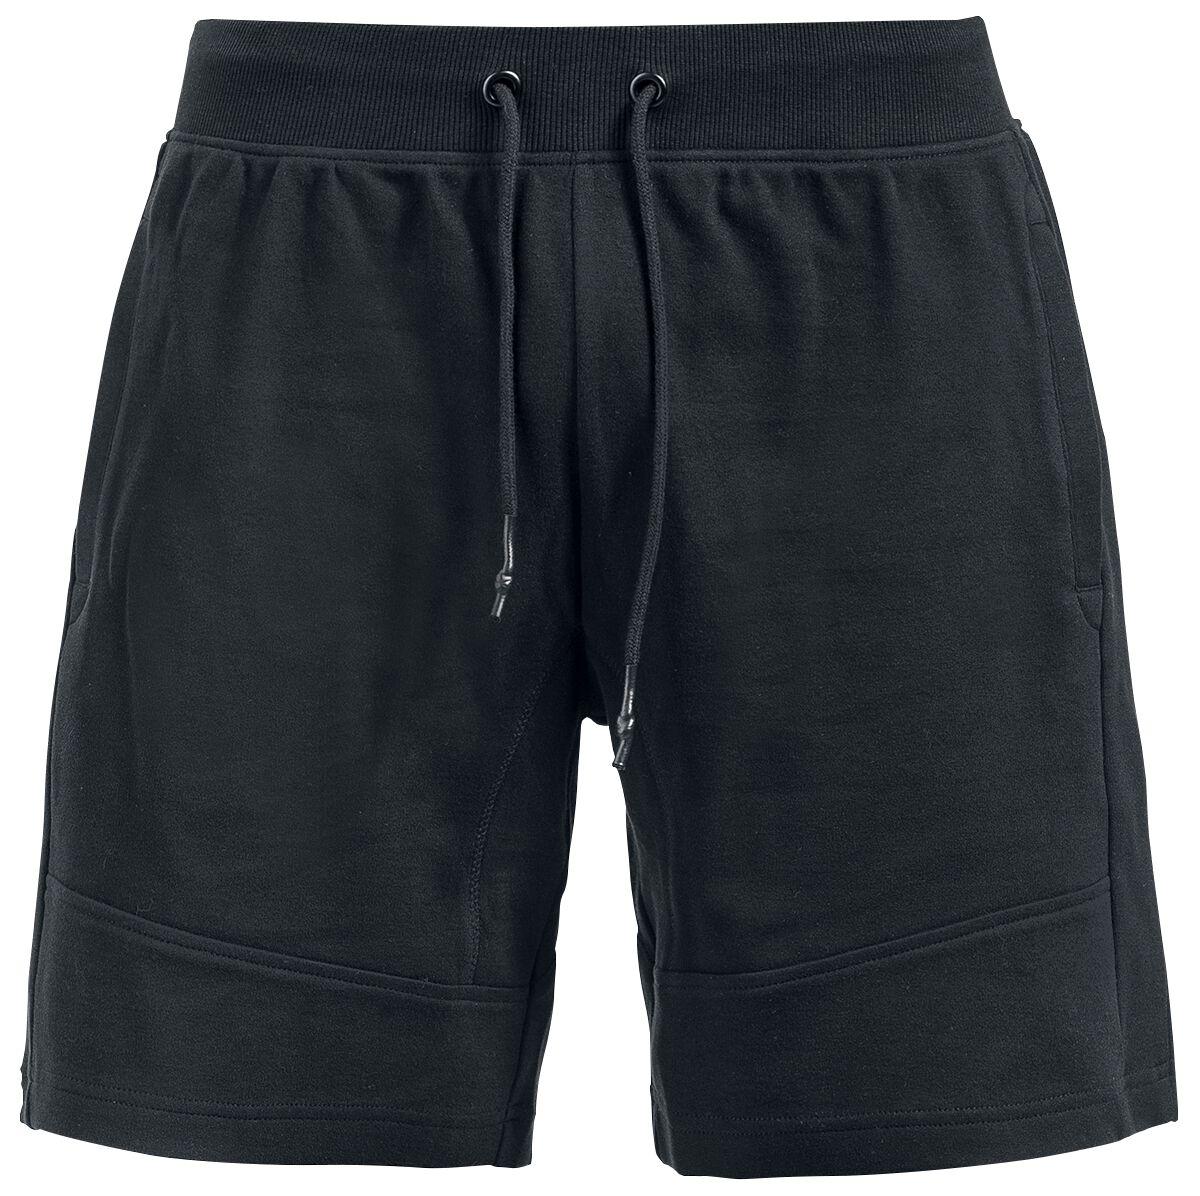 Image of   Urban Classics Interlock Sweatshorts Shorts sort